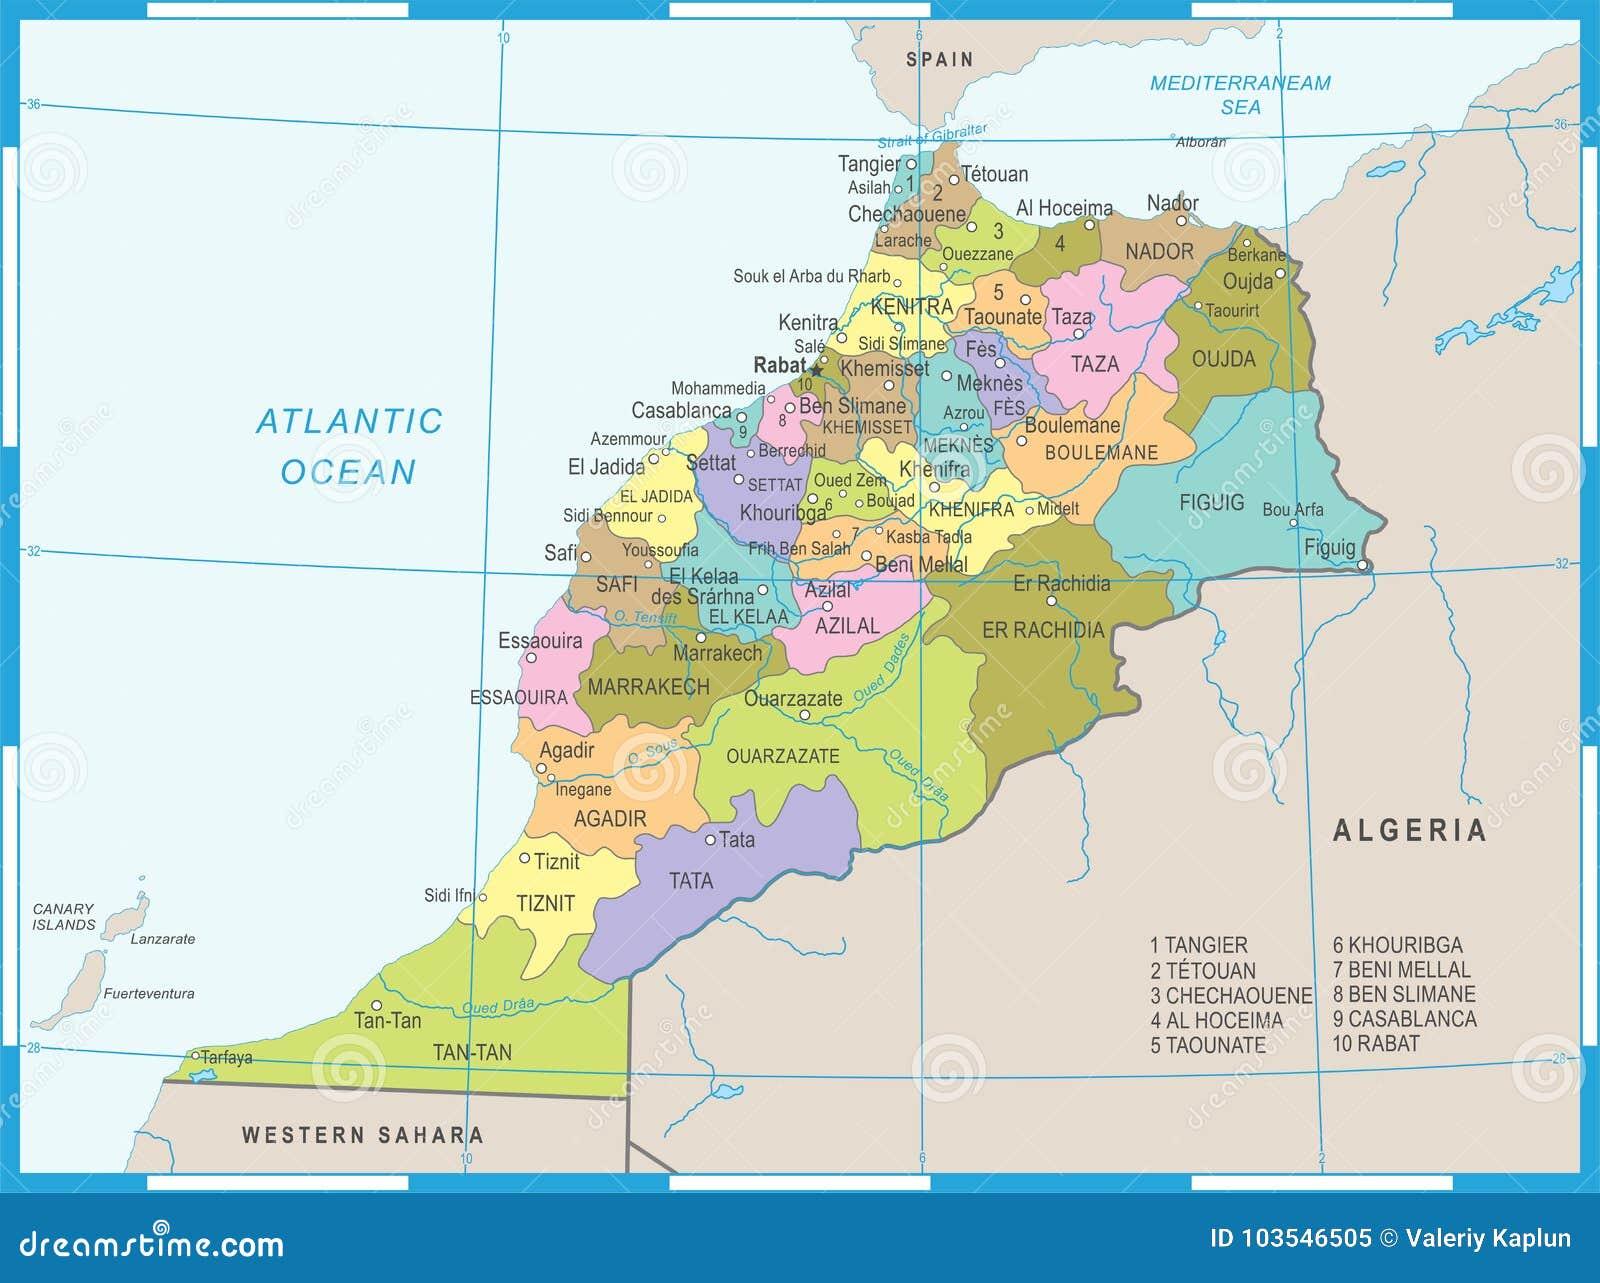 Marocco Cartina.Morocco Map Detailed Vector Illustration Stock Illustration